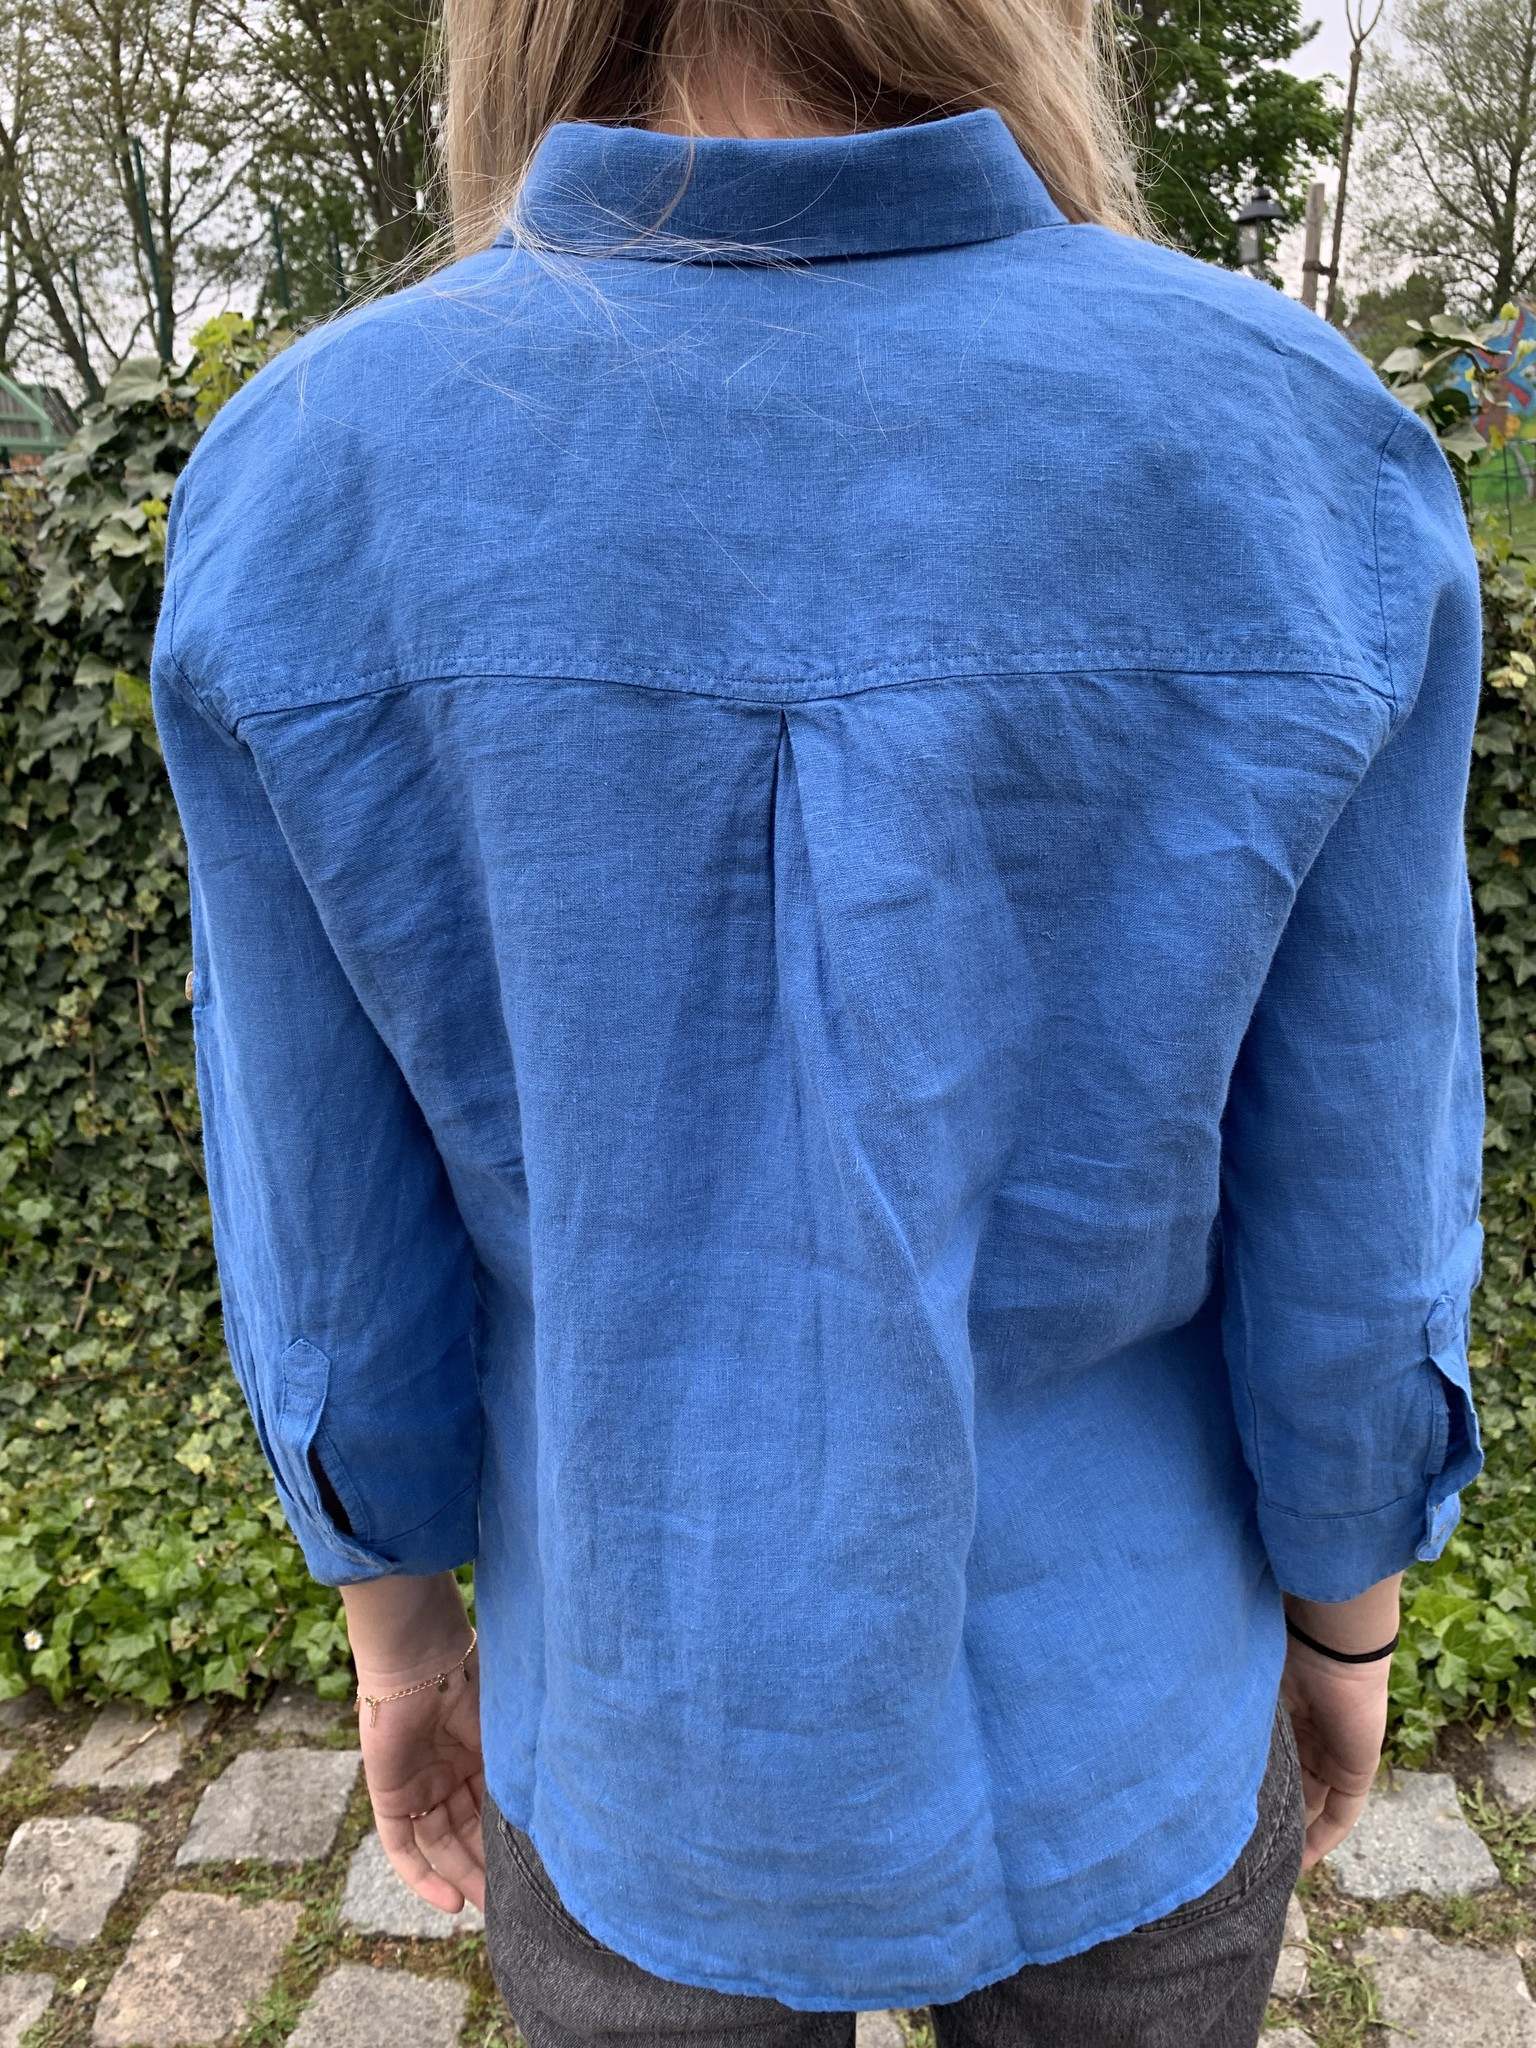 Le grenier du lin Caribbean blue pure linen blouse with 3/4 sleeves